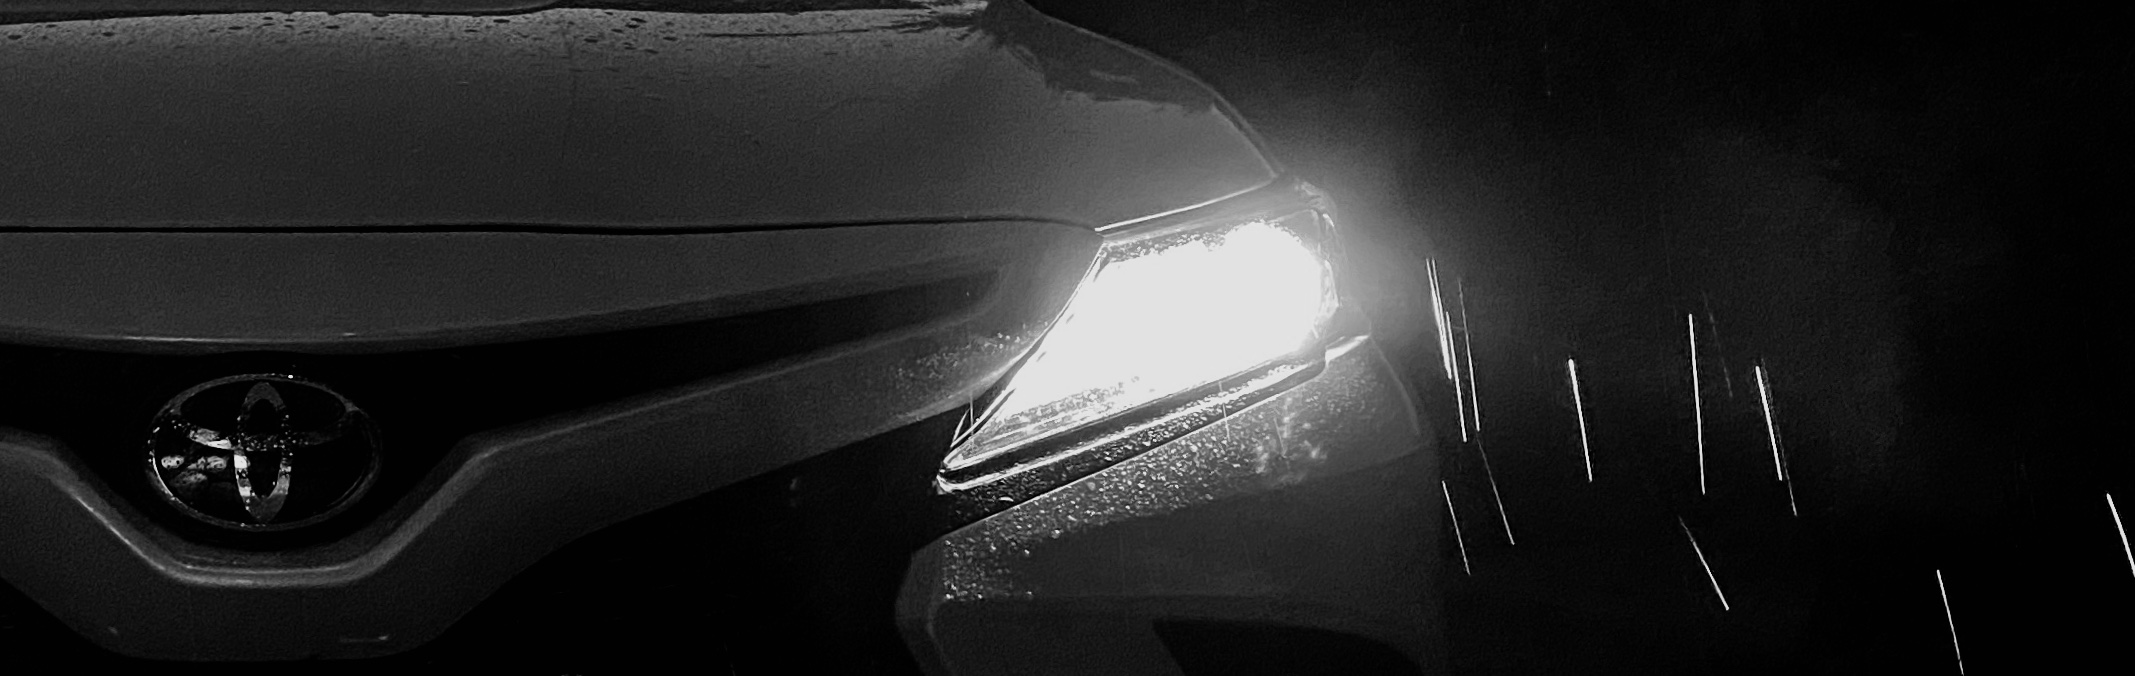 Camry XSE Lights